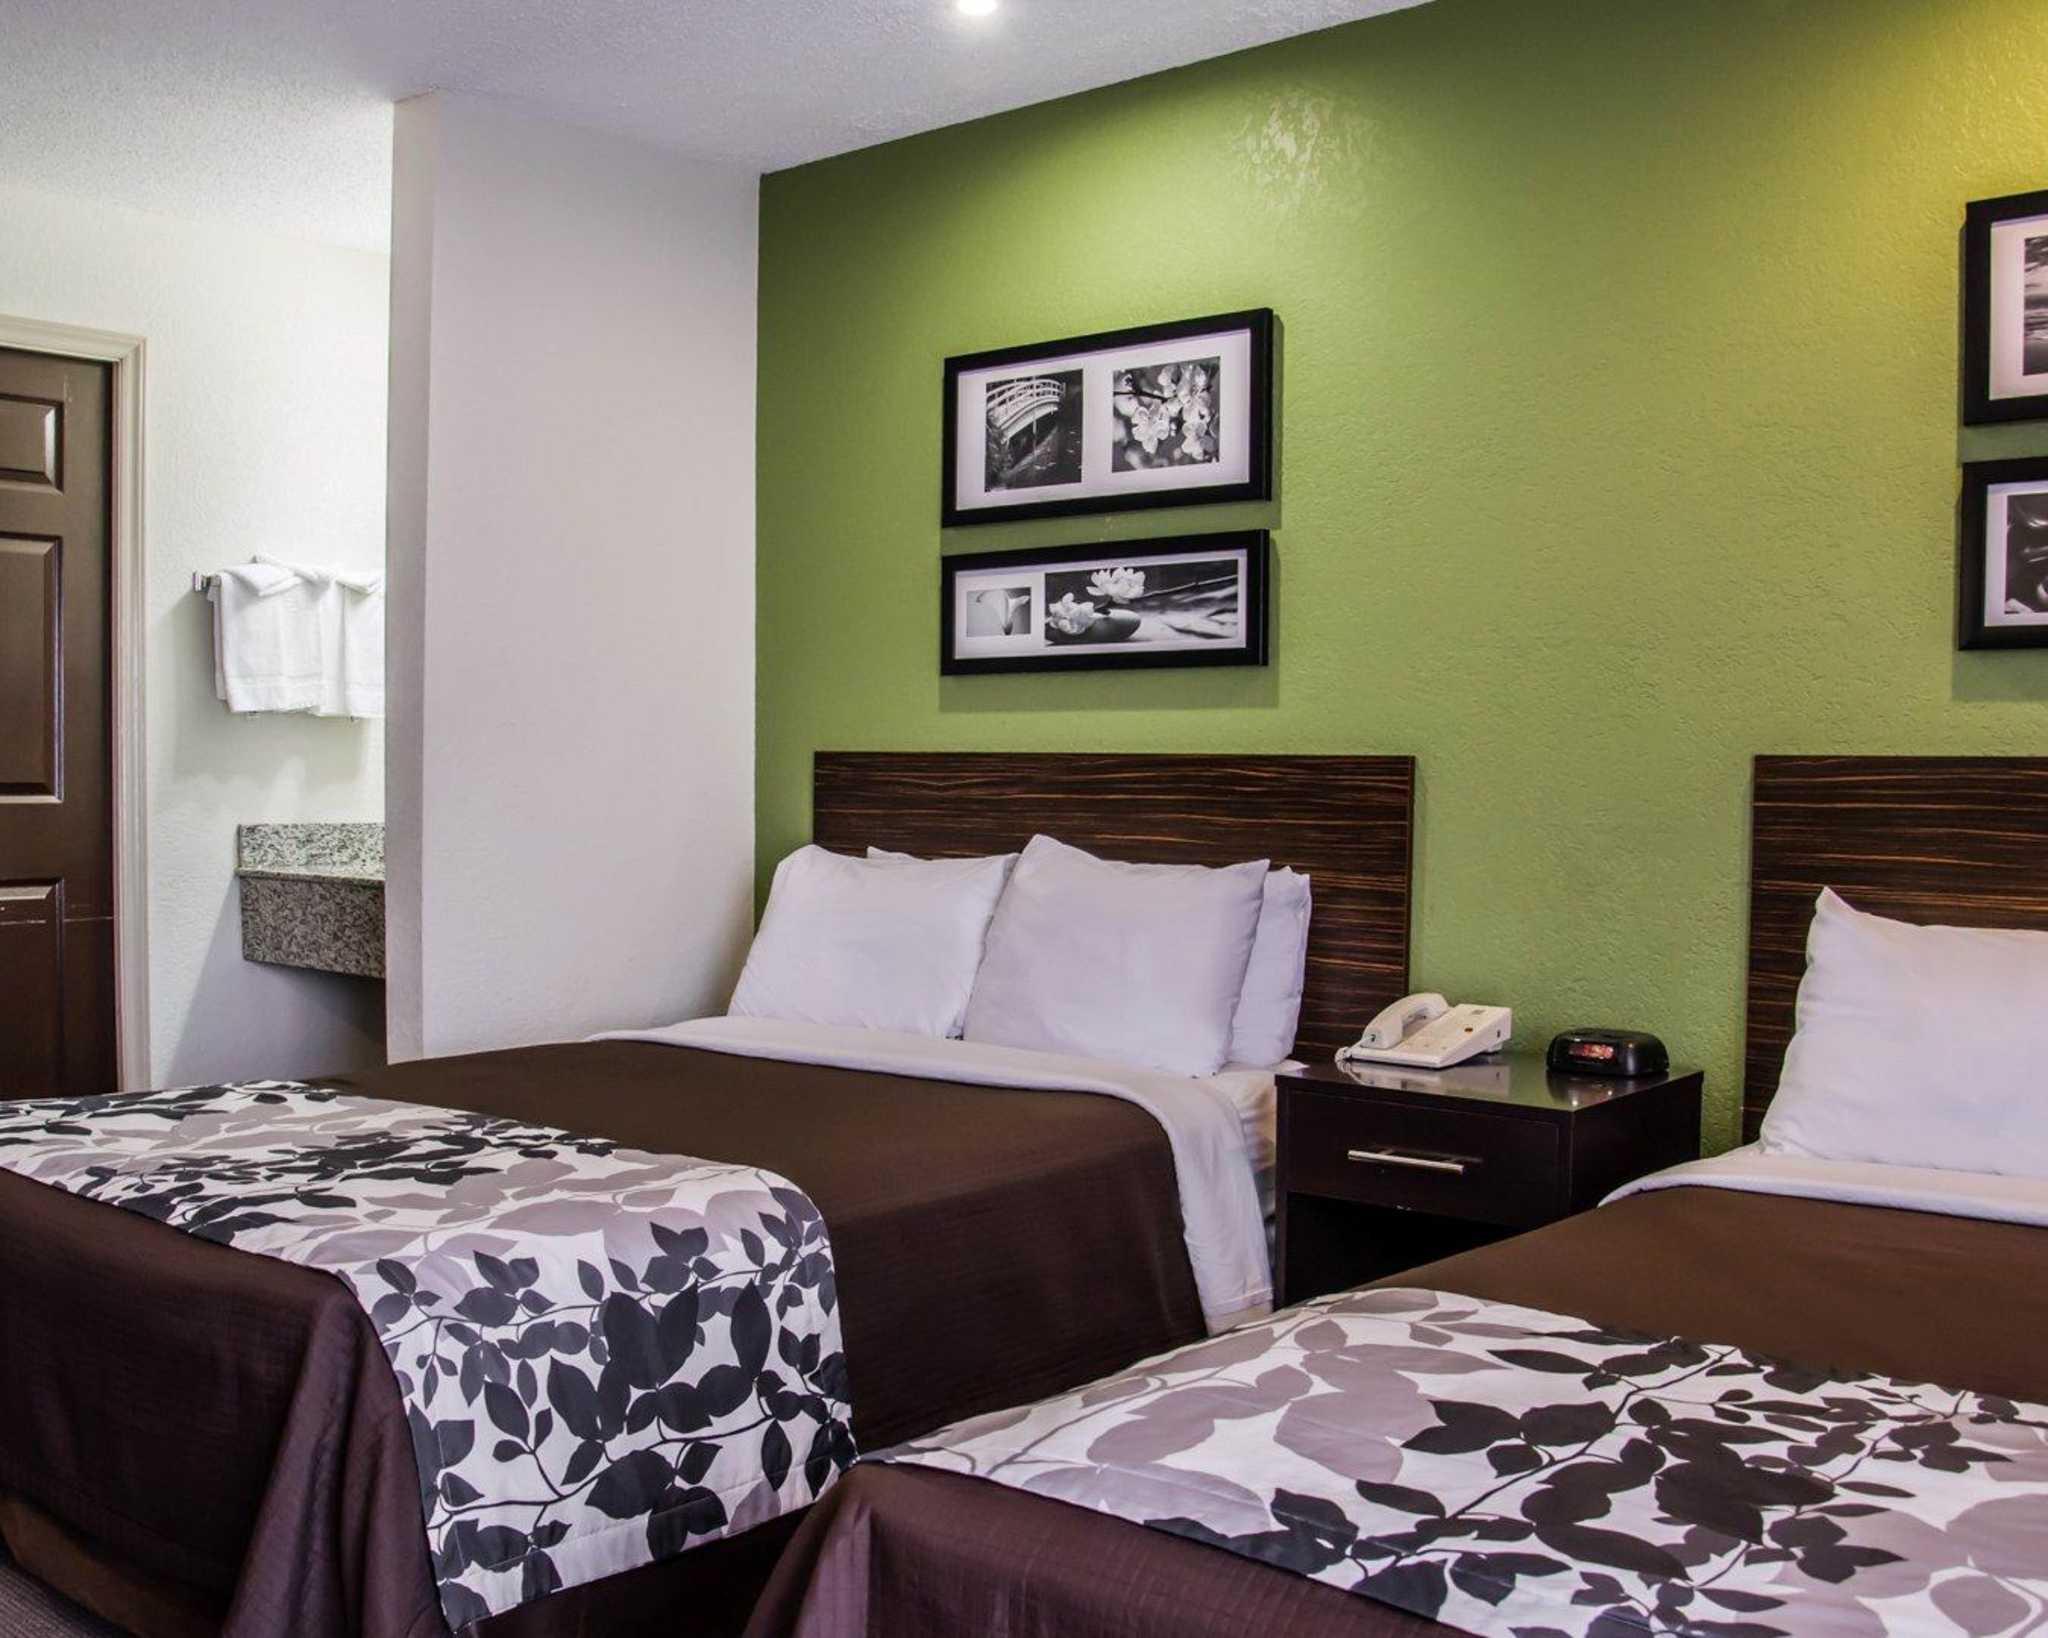 Sleep Inn Concord - Kannapolis image 4